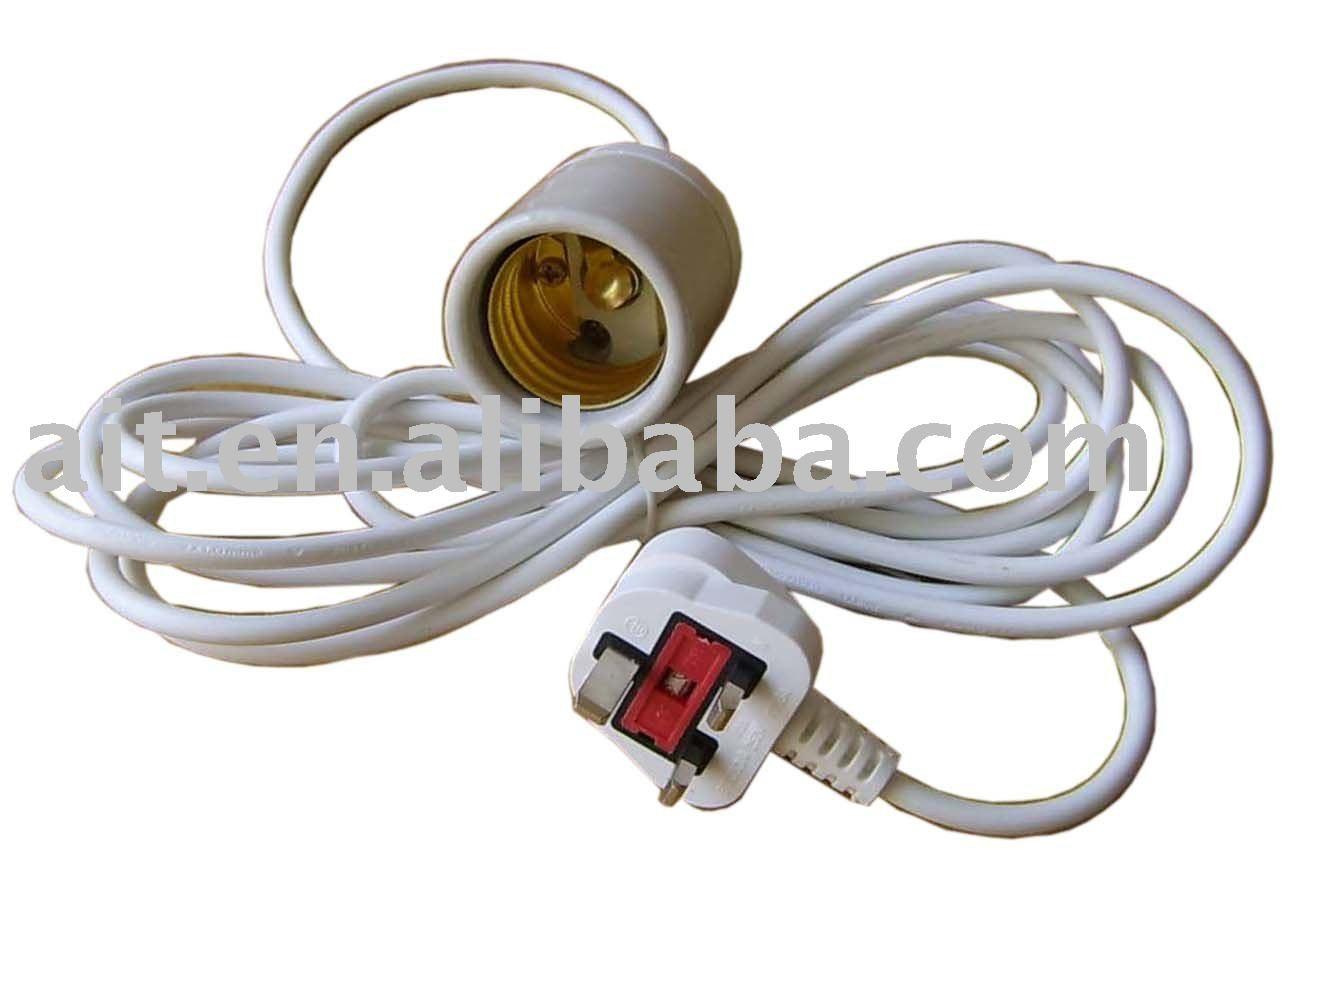 ballast wiring lighting uk420  ballast  get free image